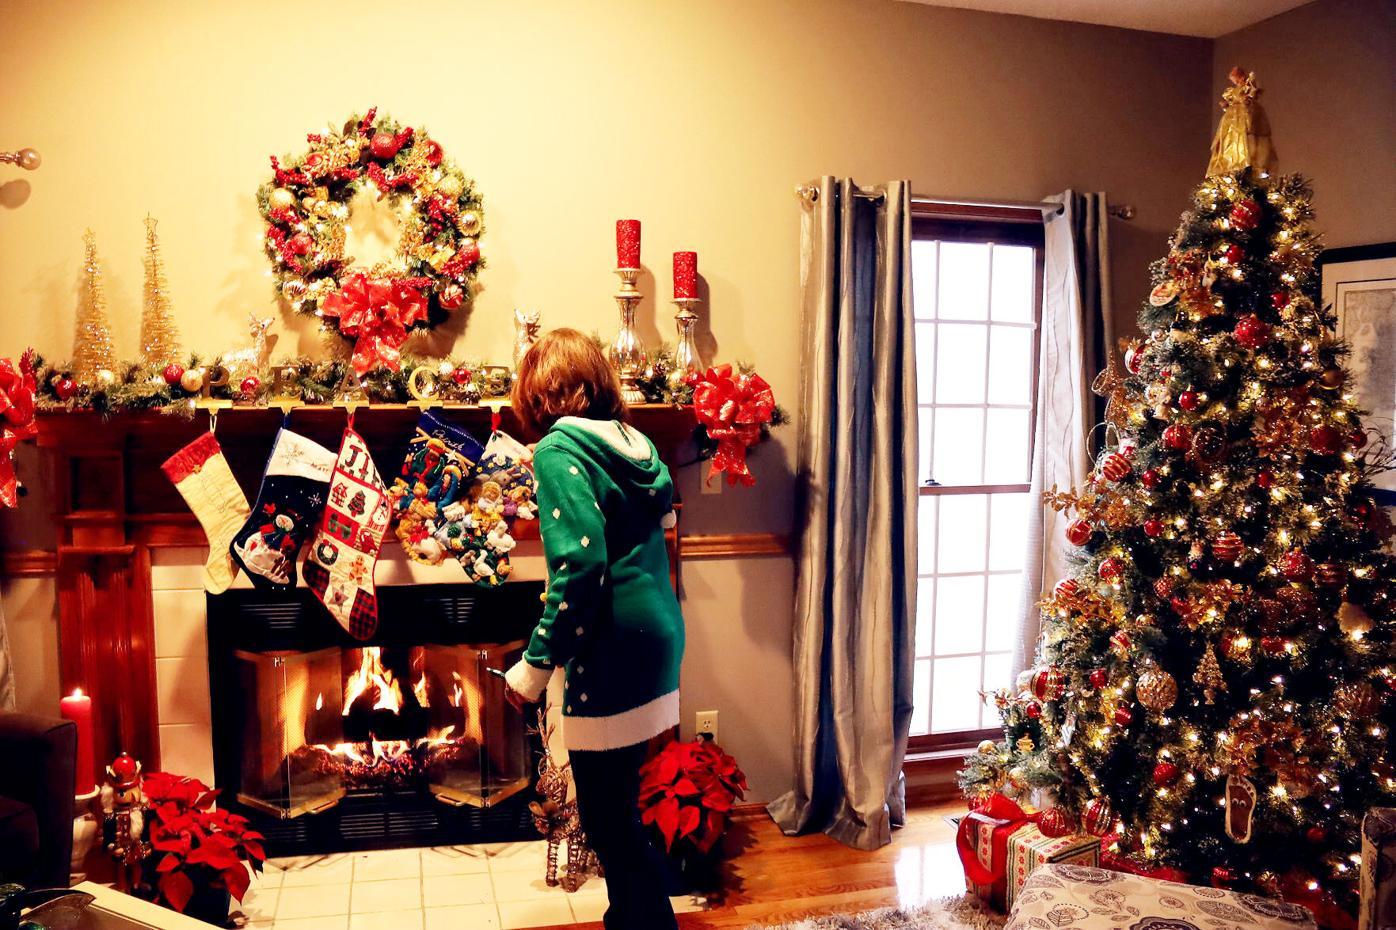 11-12-20 Christmas Homes Tour Preview 2.jpg